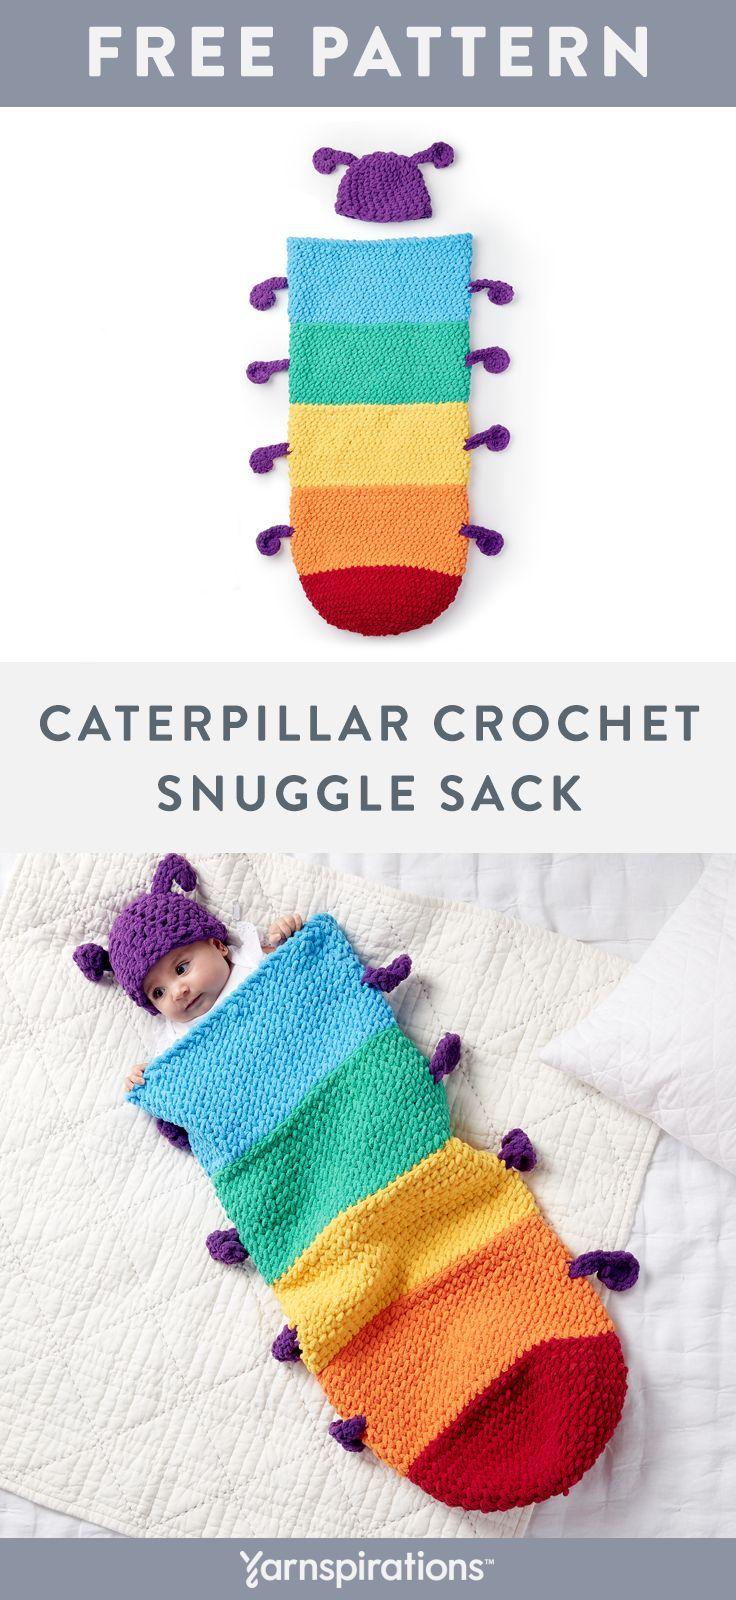 Caterpillar crochet Snuggle Sack | Free Crochet Sn…